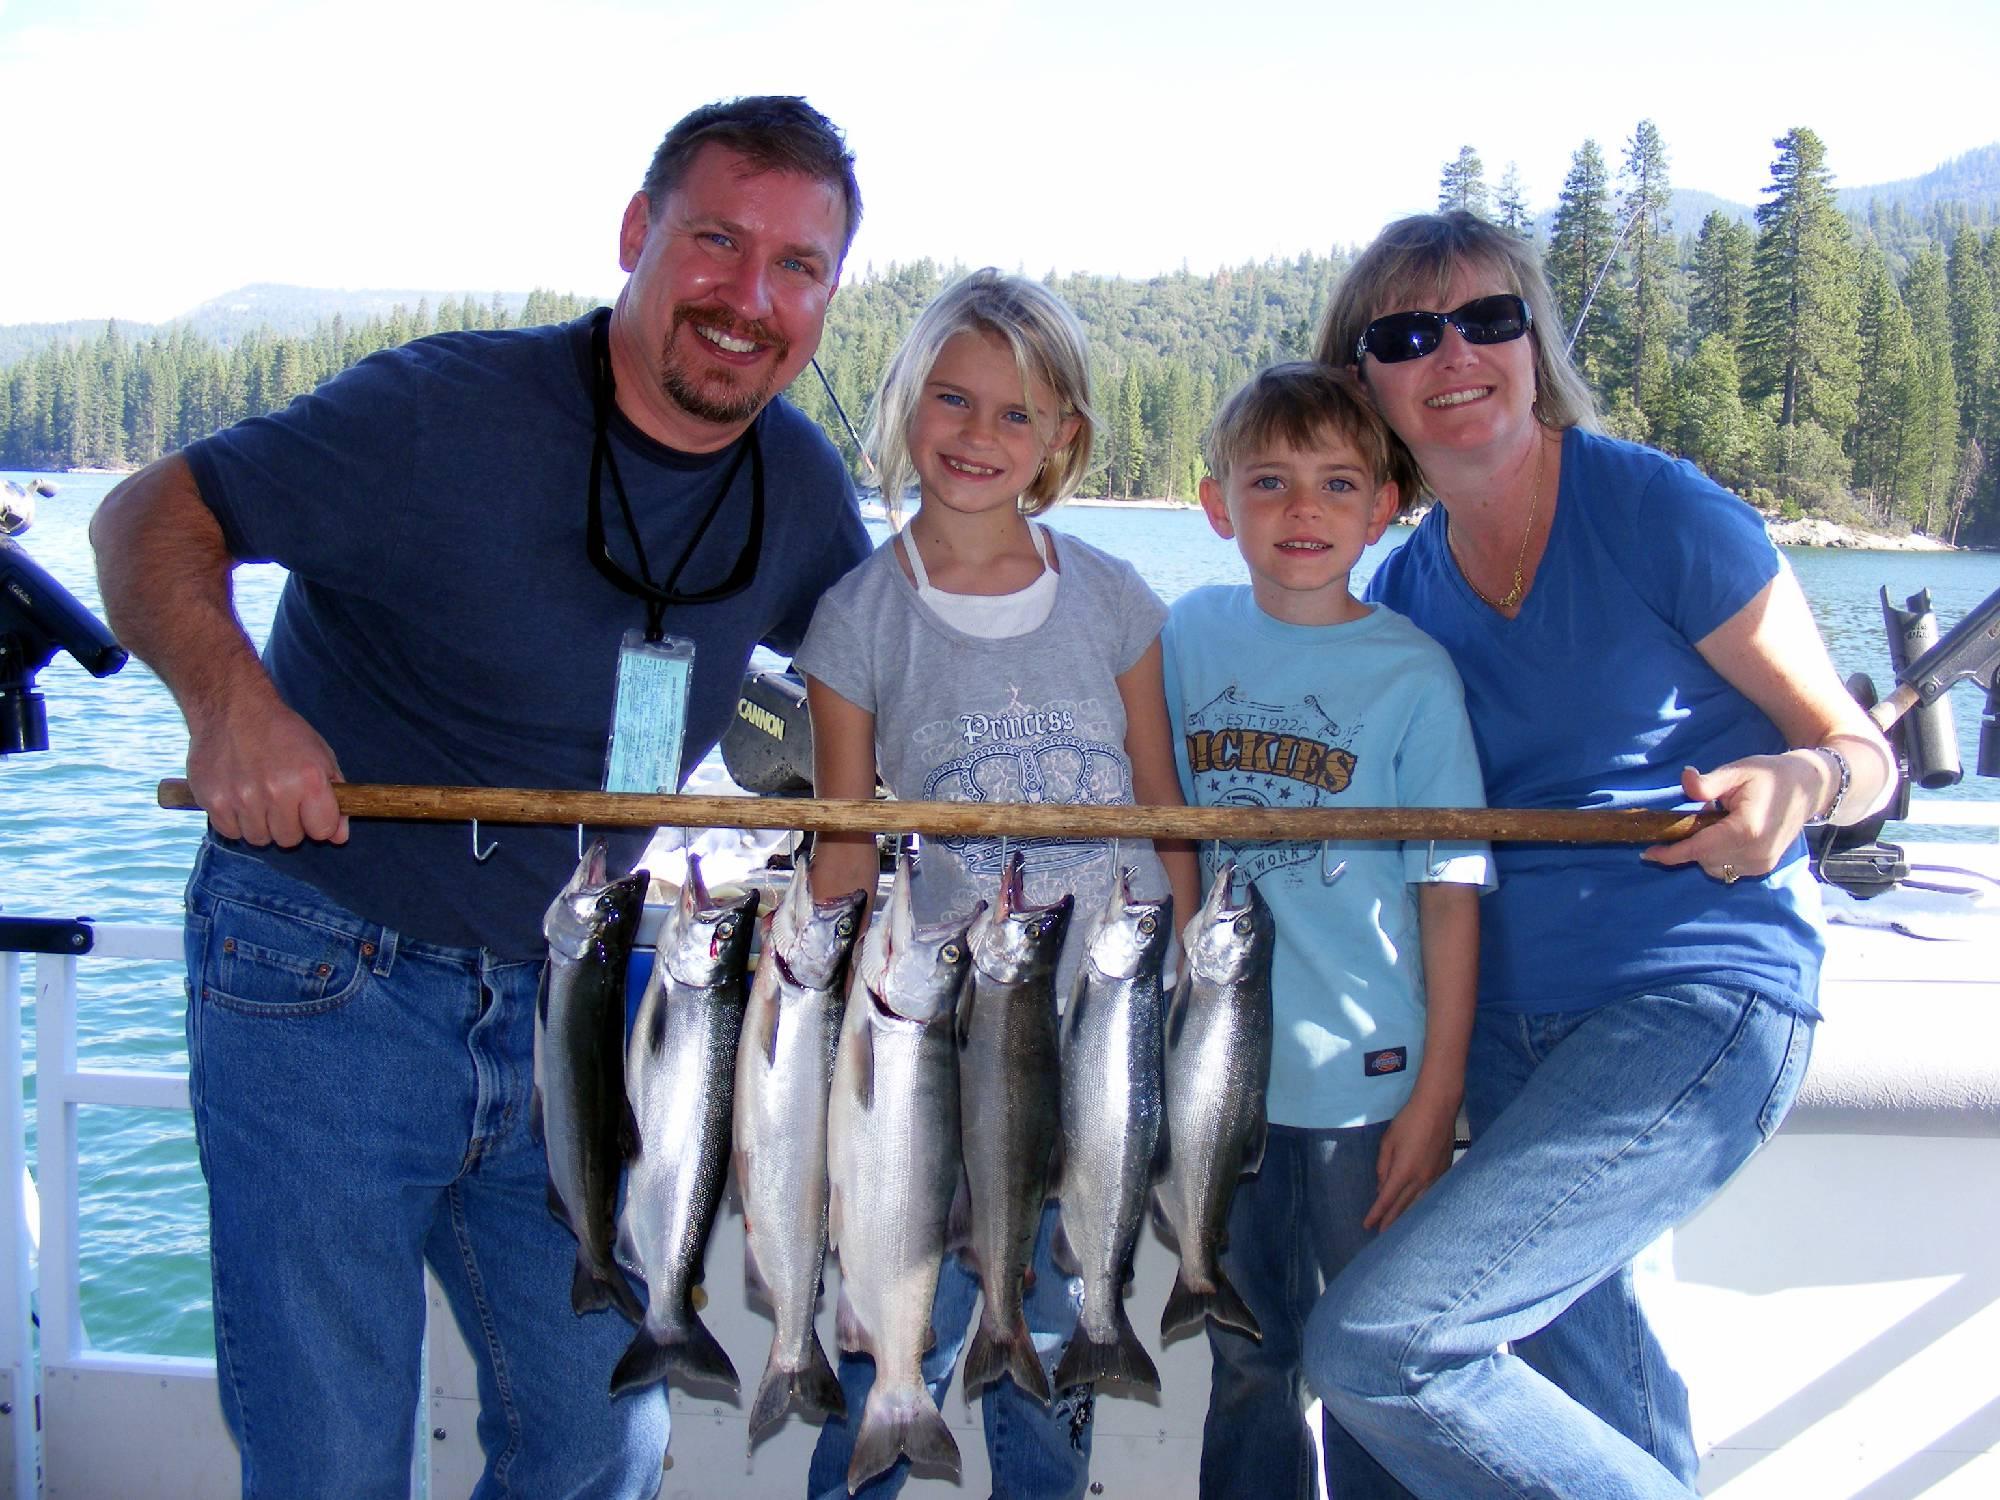 Shaver lake bass lake fishing guide service kokanee for Bass lake ca fishing